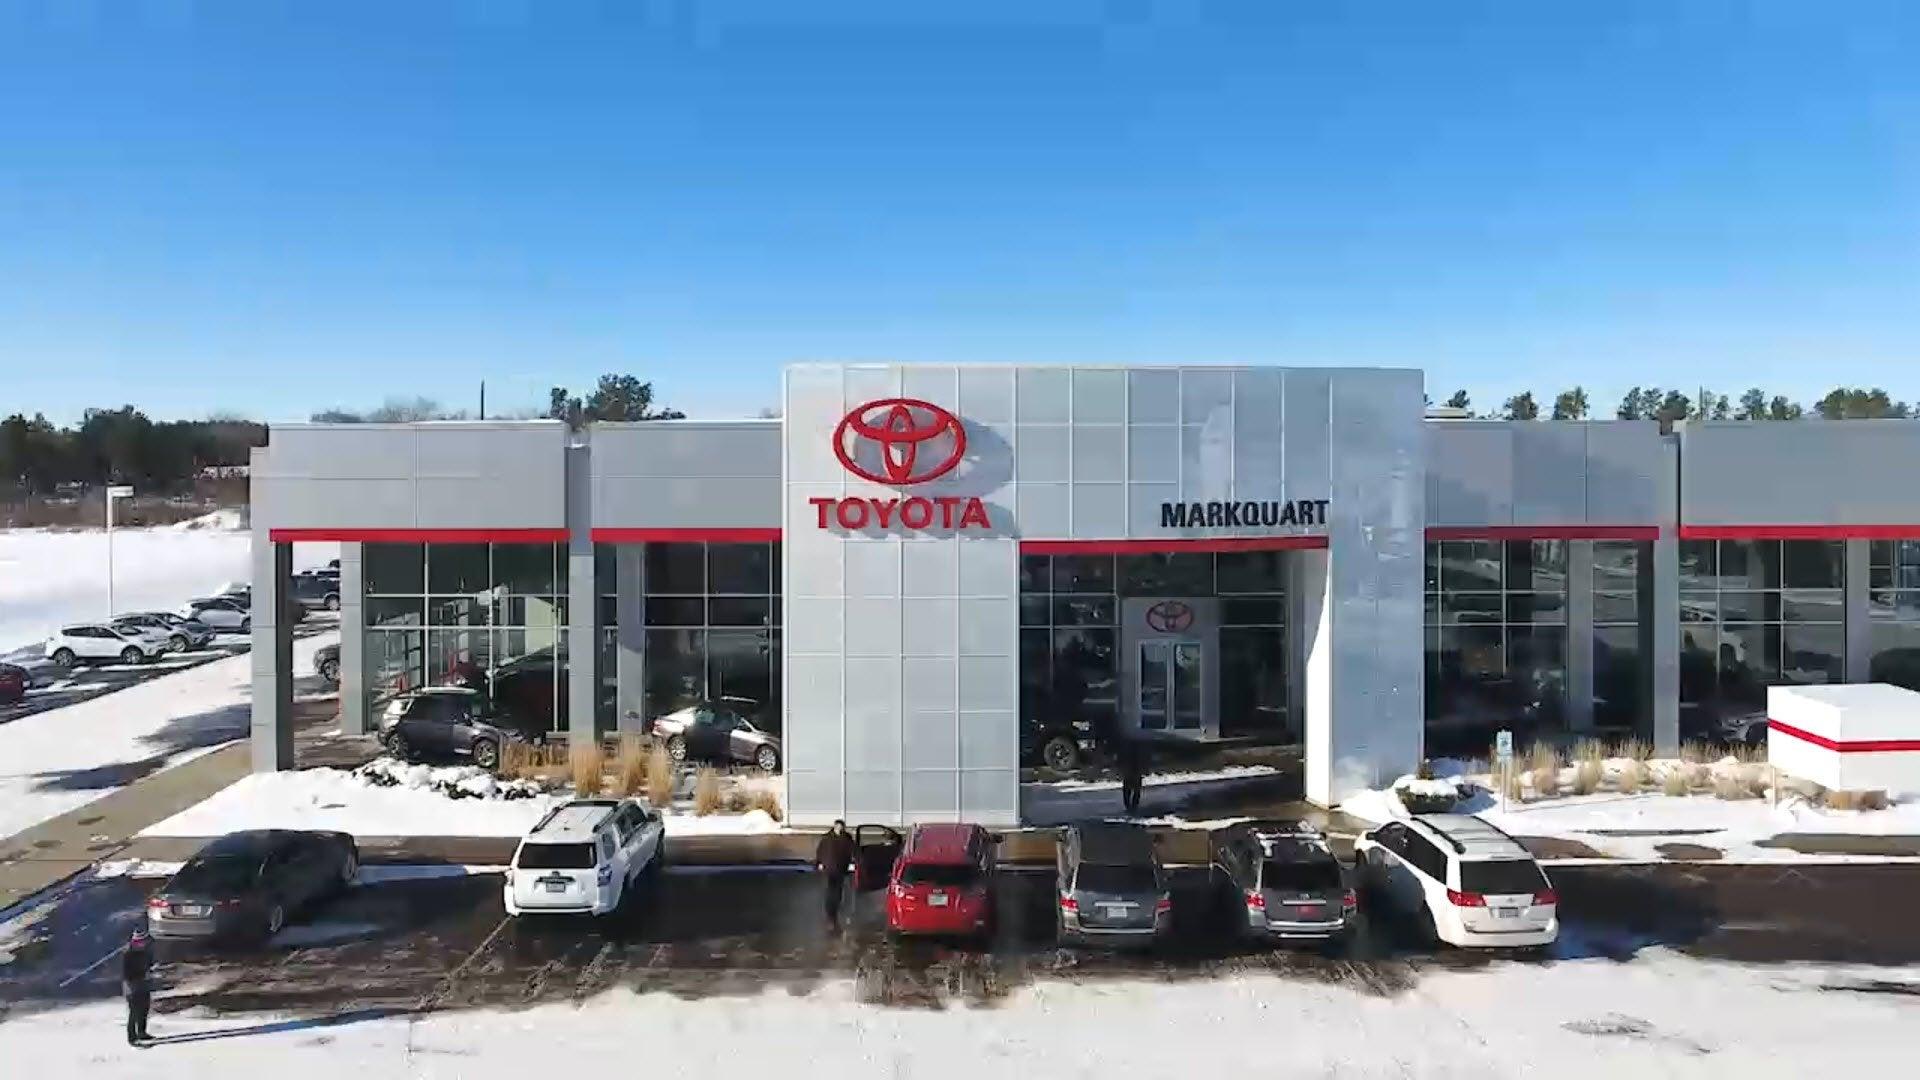 Toyota Dealers Near Me >> Markquart Toyota Dealer Near Eau Claire New Used Car